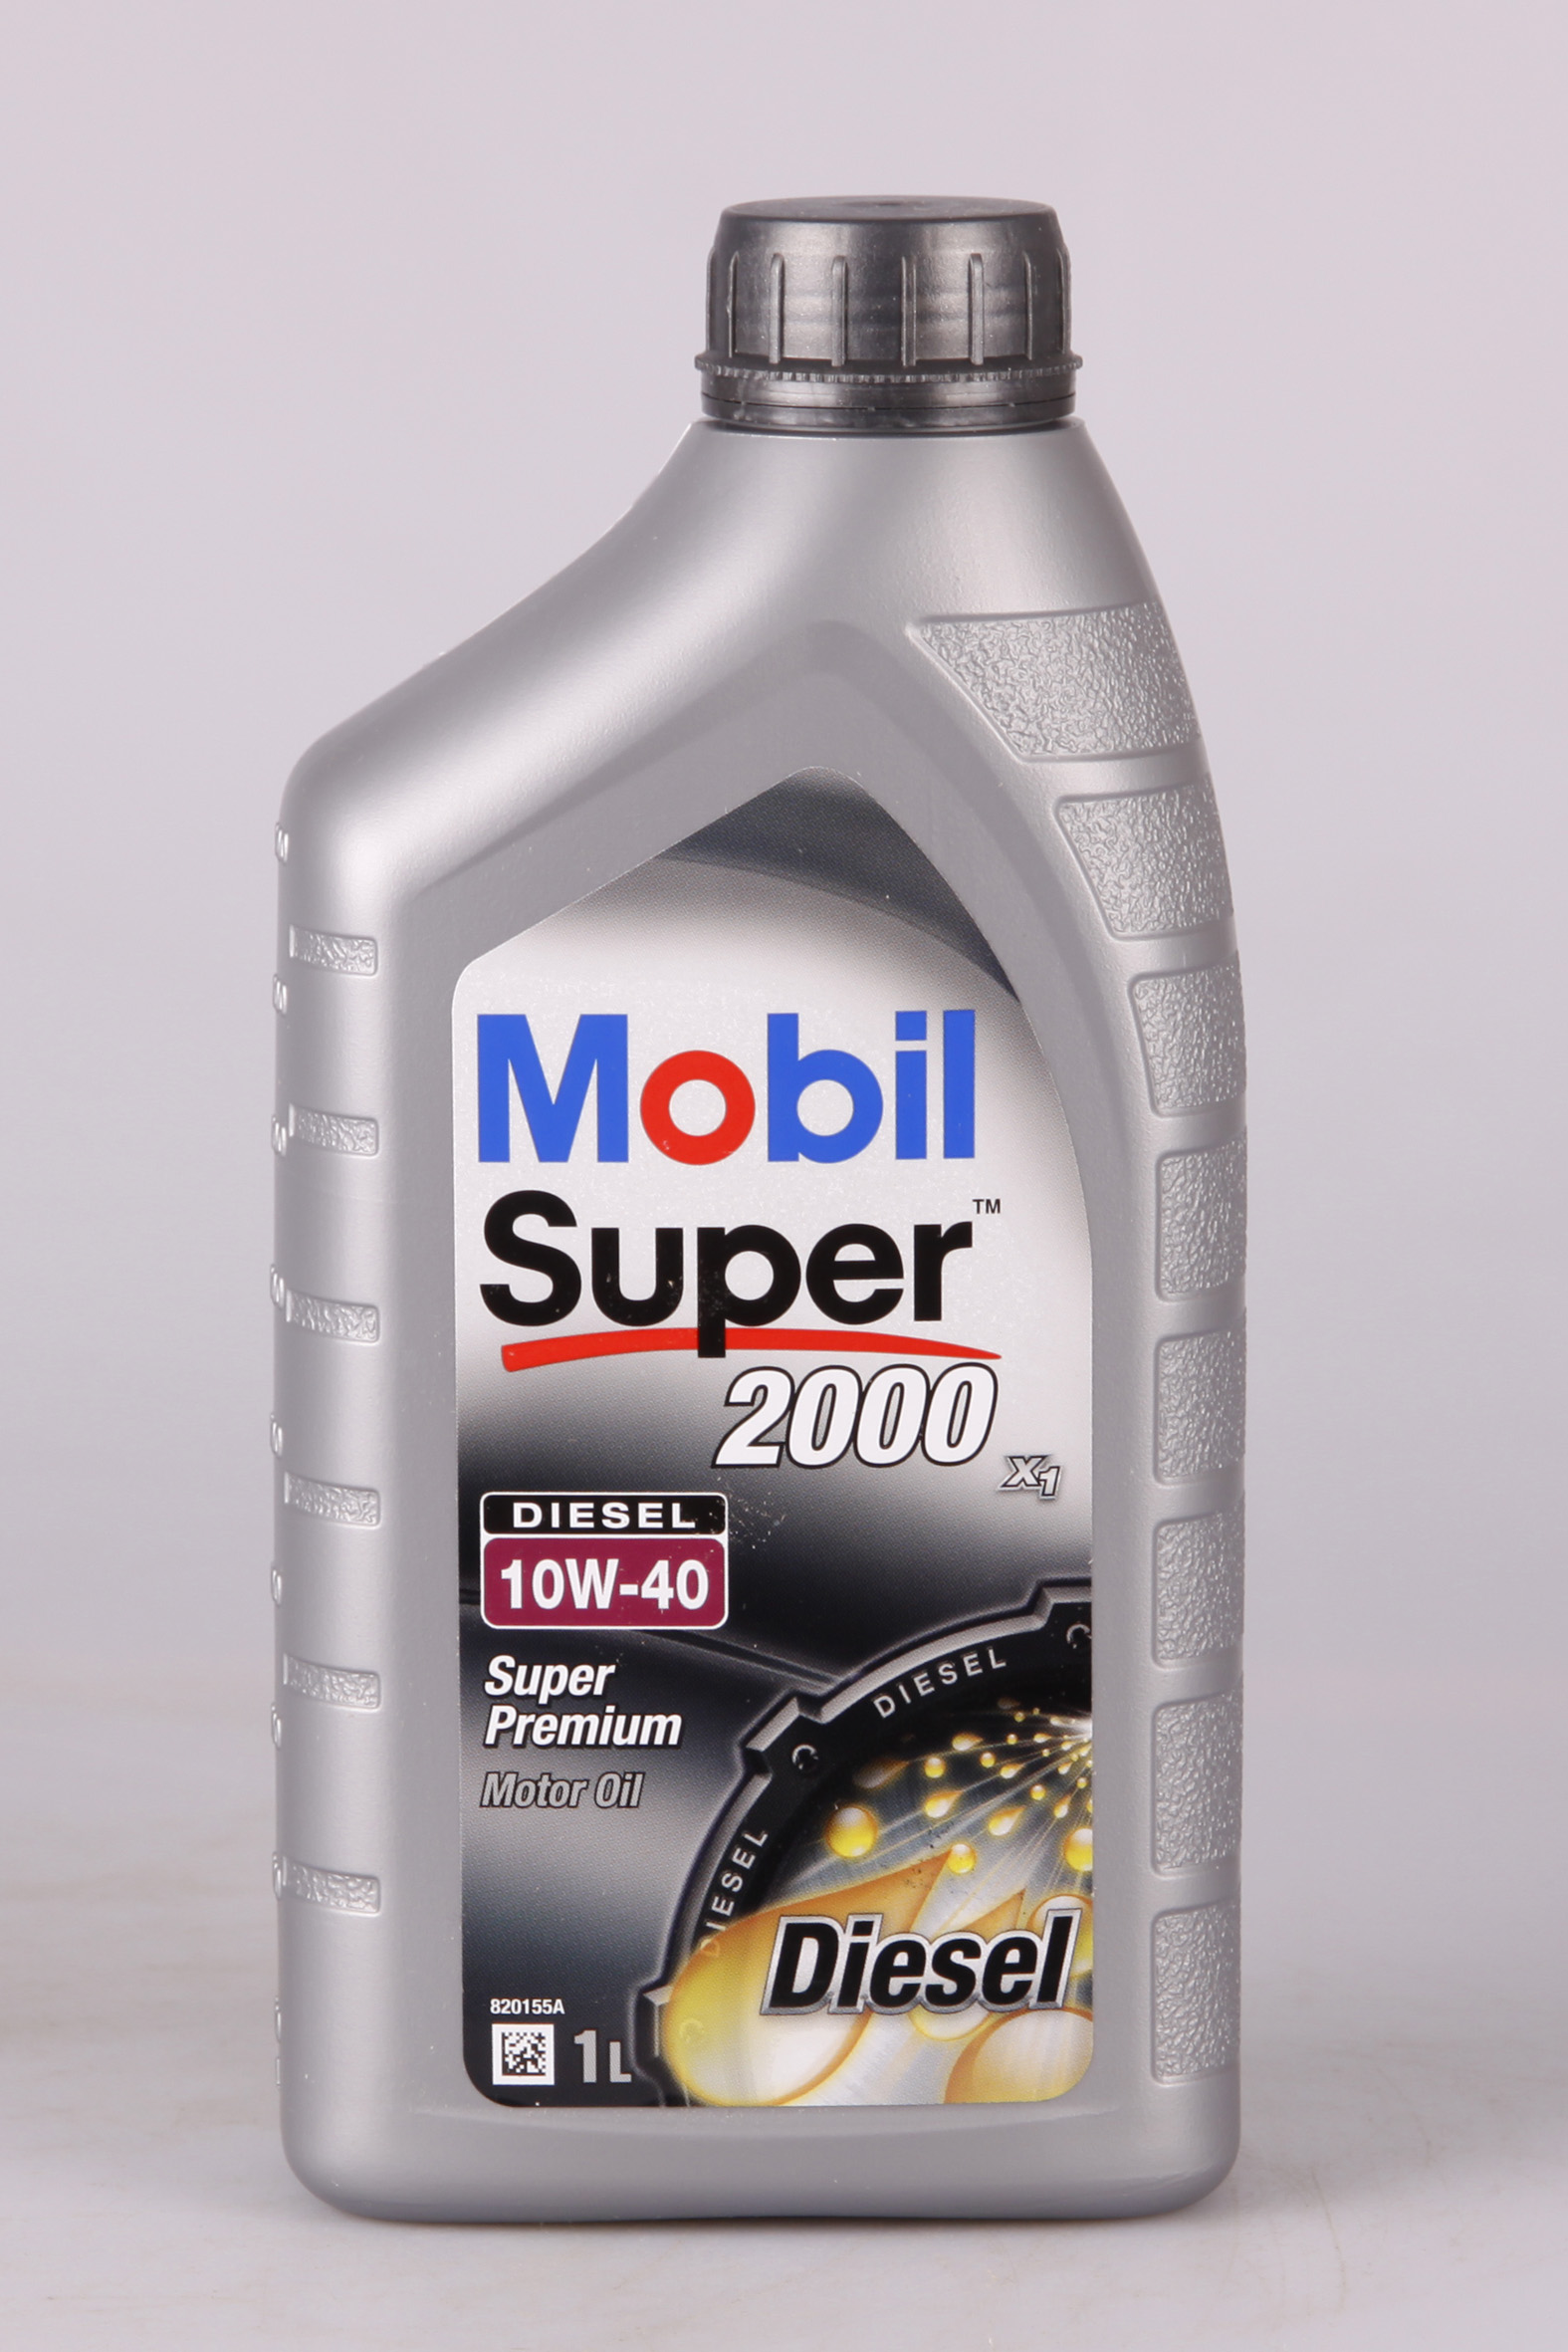 Mobil Super 2000 X1 Diesel 10W-40 1 Liter